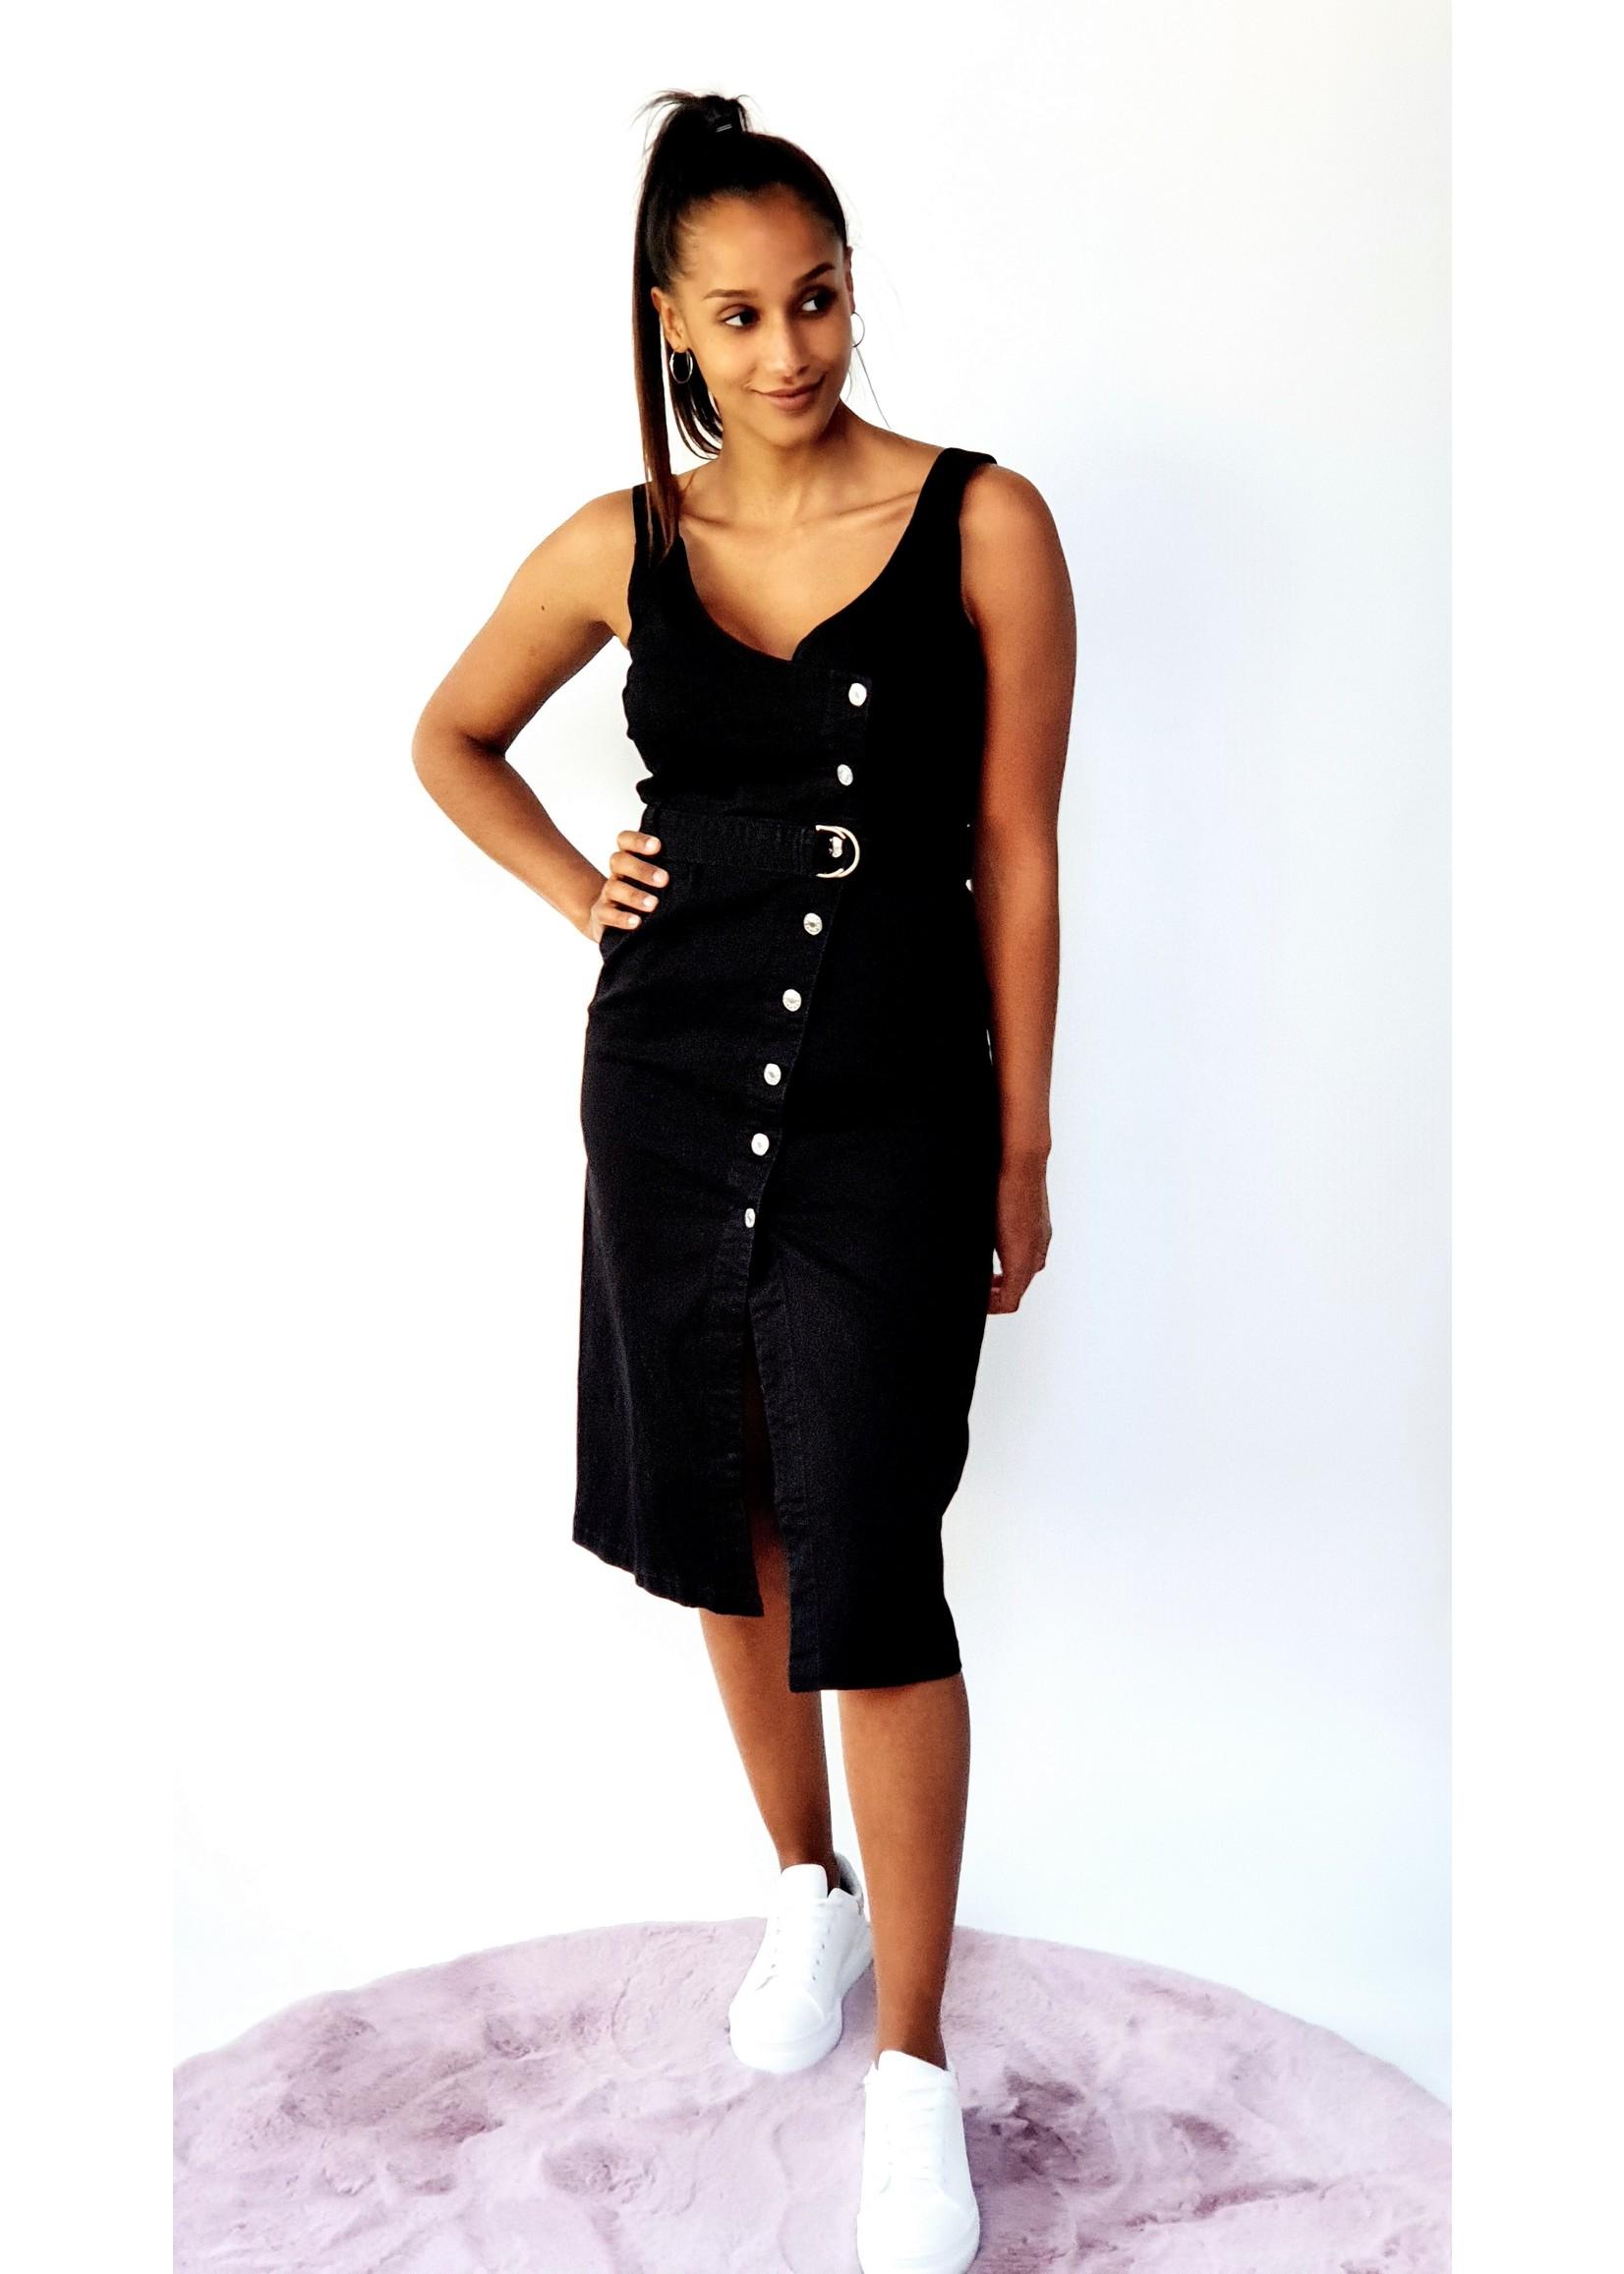 Thé sister of the black dress